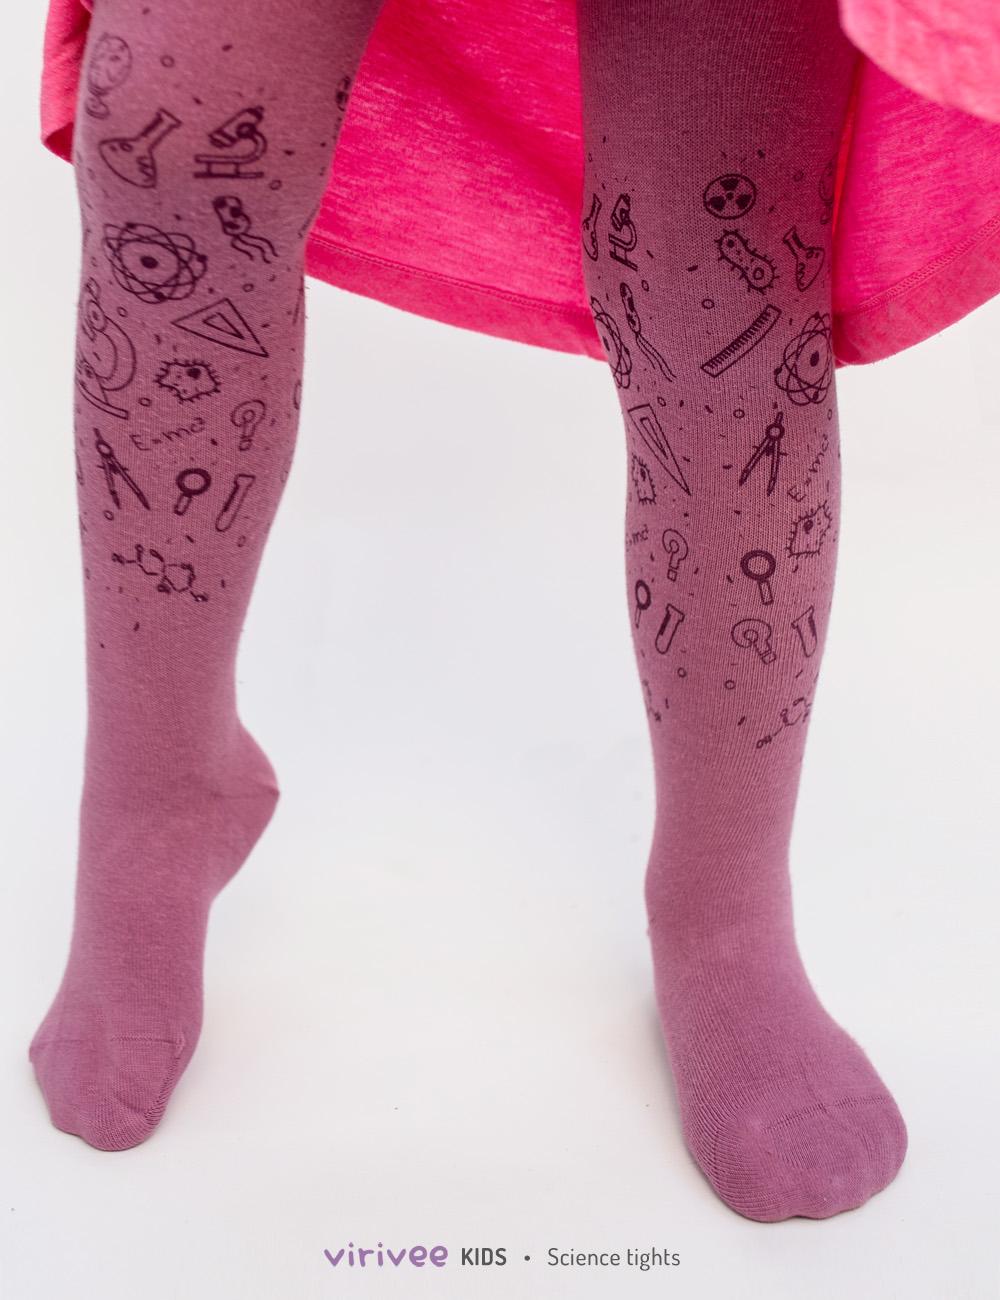 Science, mathematics, biology, physics themed tights